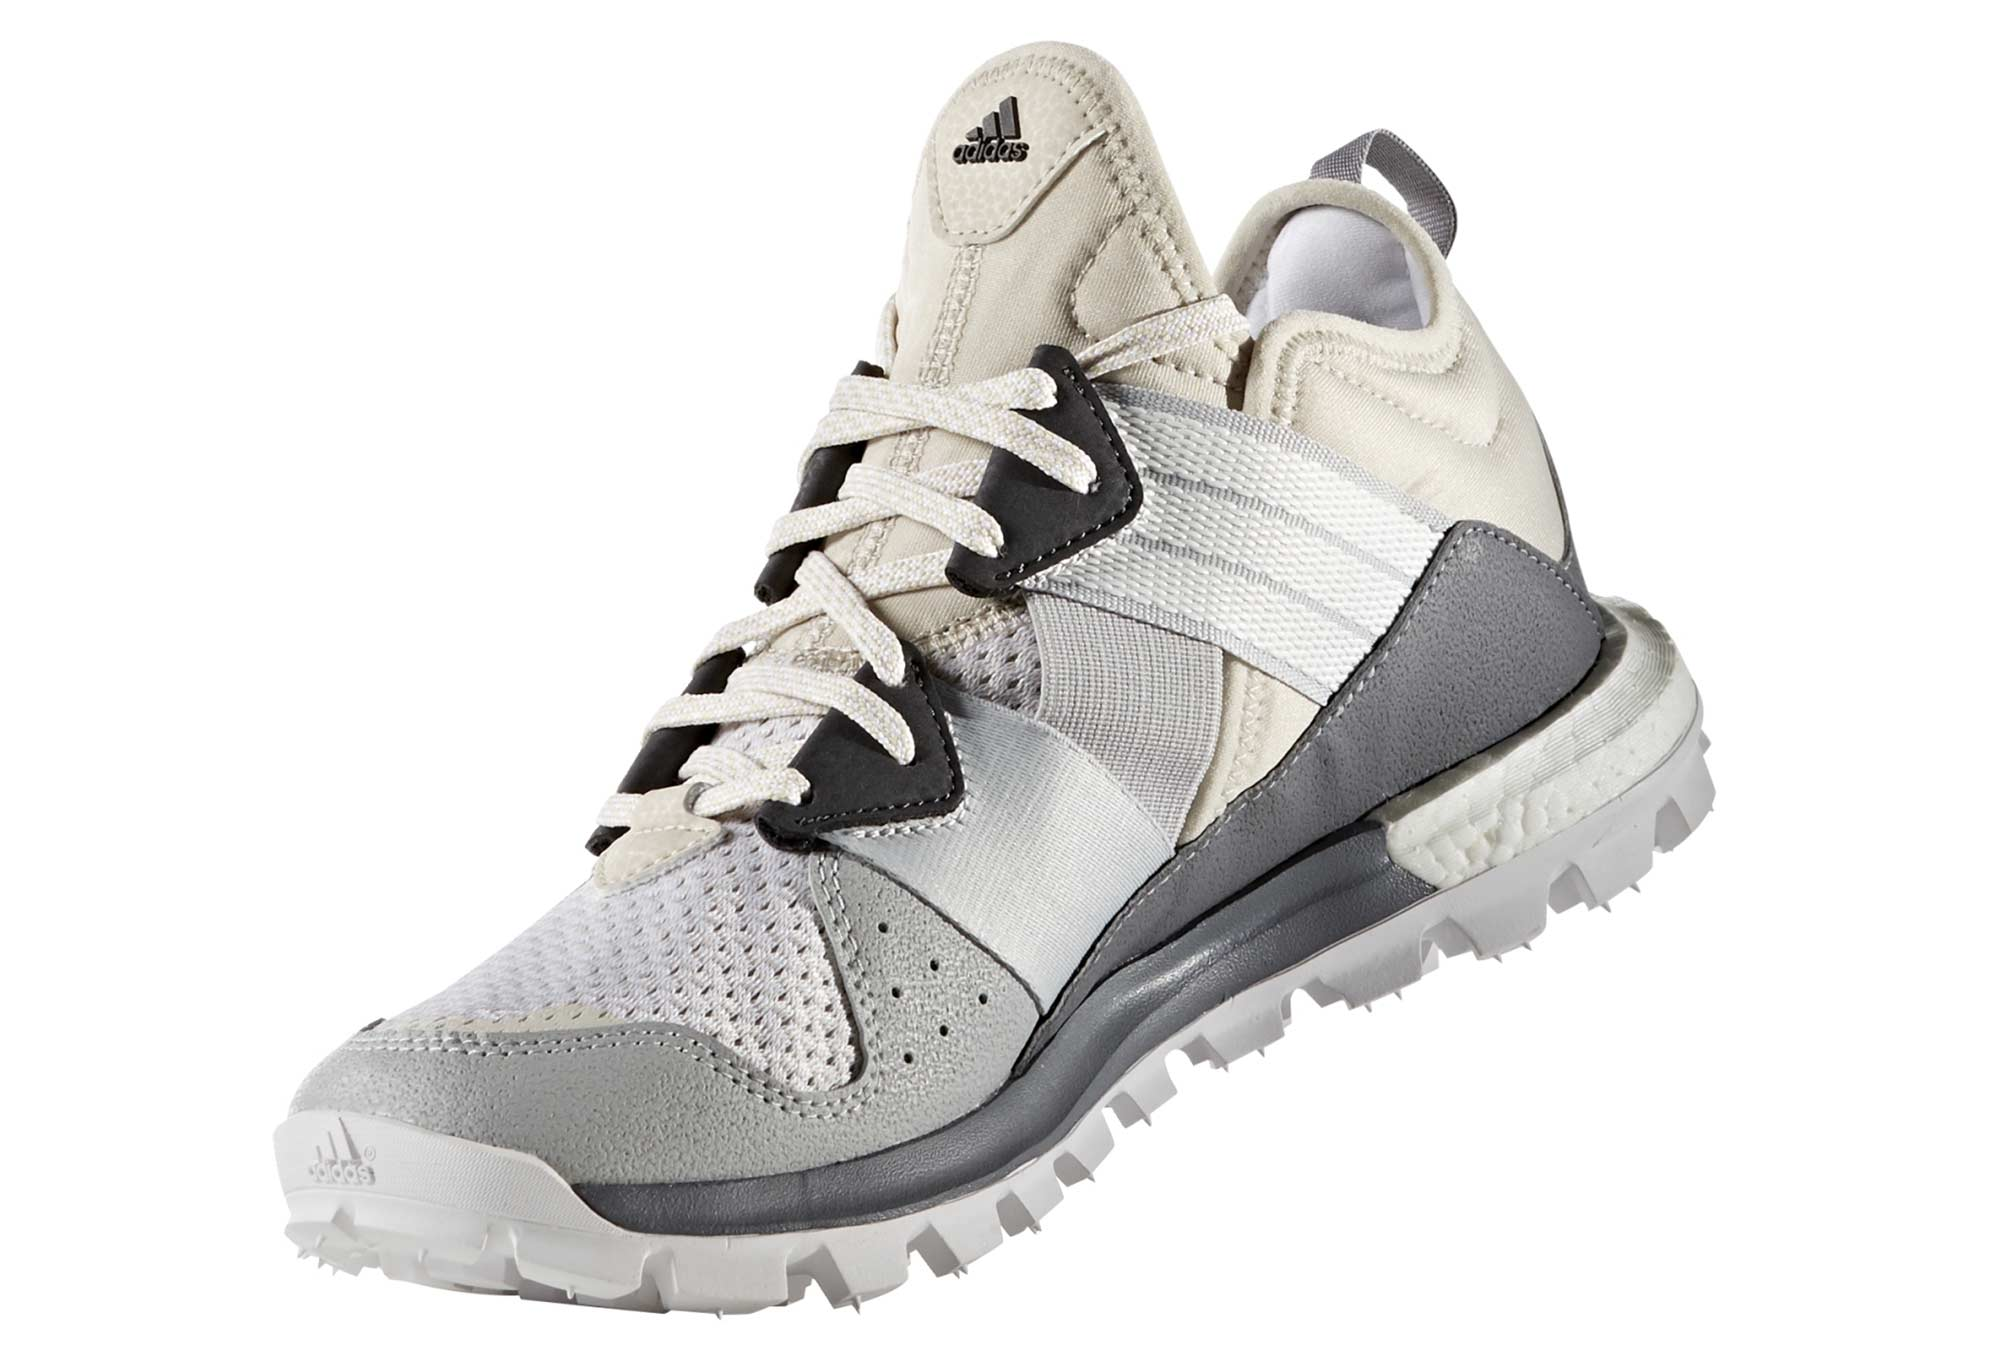 d2042afc2 adidas running RESPONSE TR BOOST Beige Grey Men